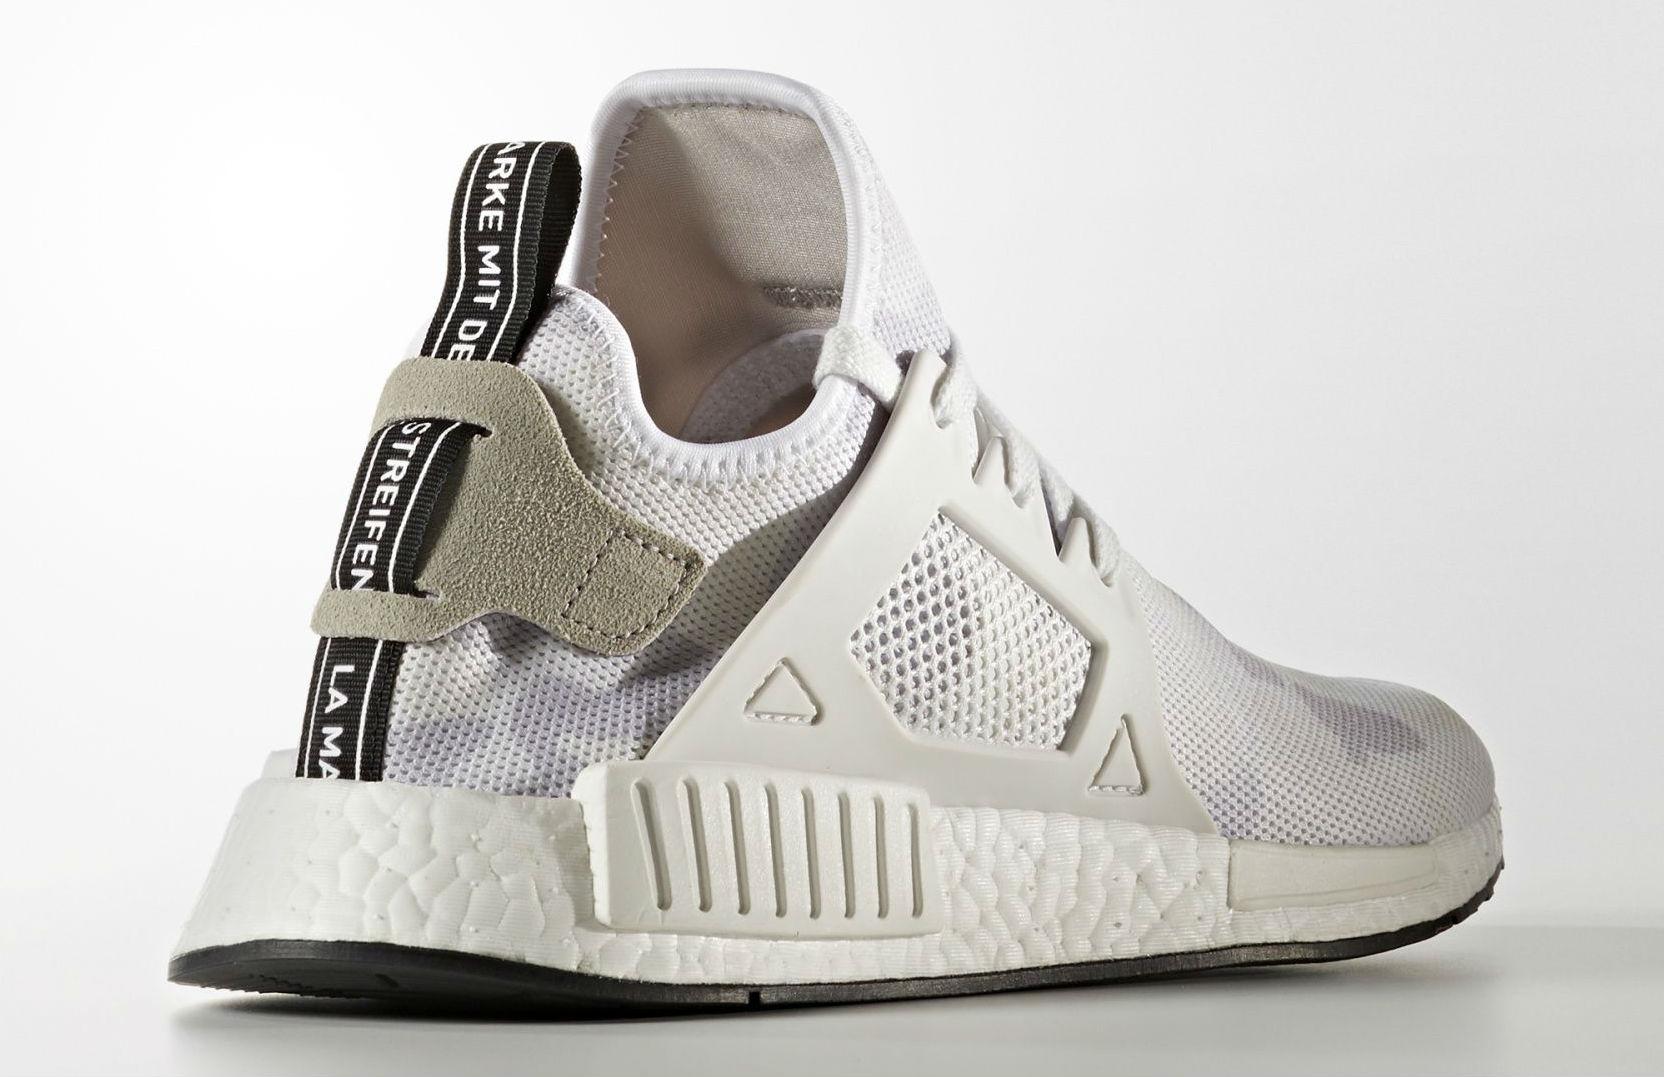 Black And White Camo Basketball Shoes